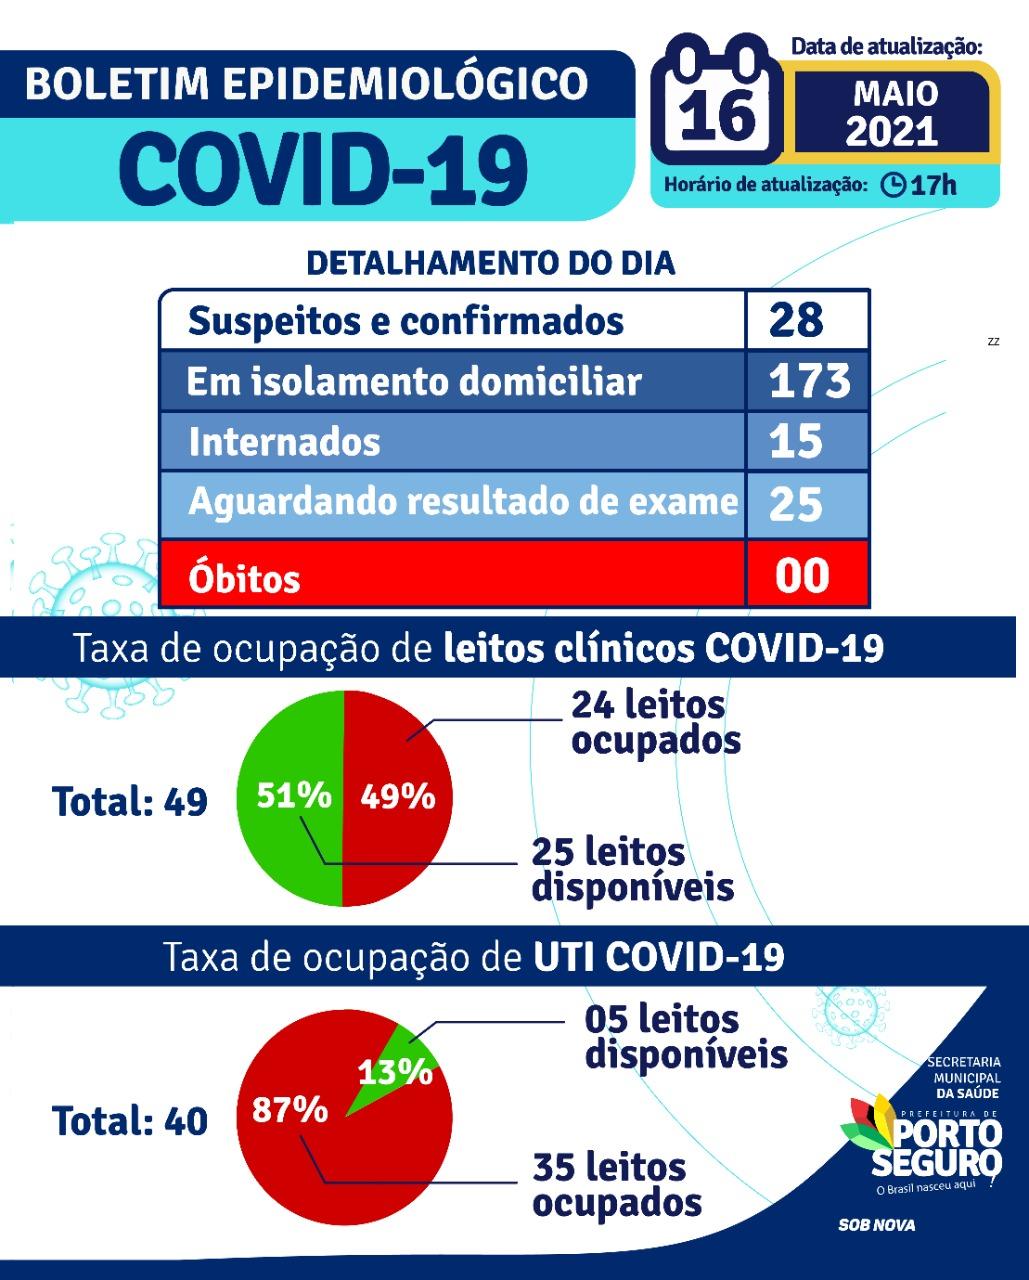 Porto Seguro: Boletim Epidemiológico Covid-19 (16/05/2021) 22